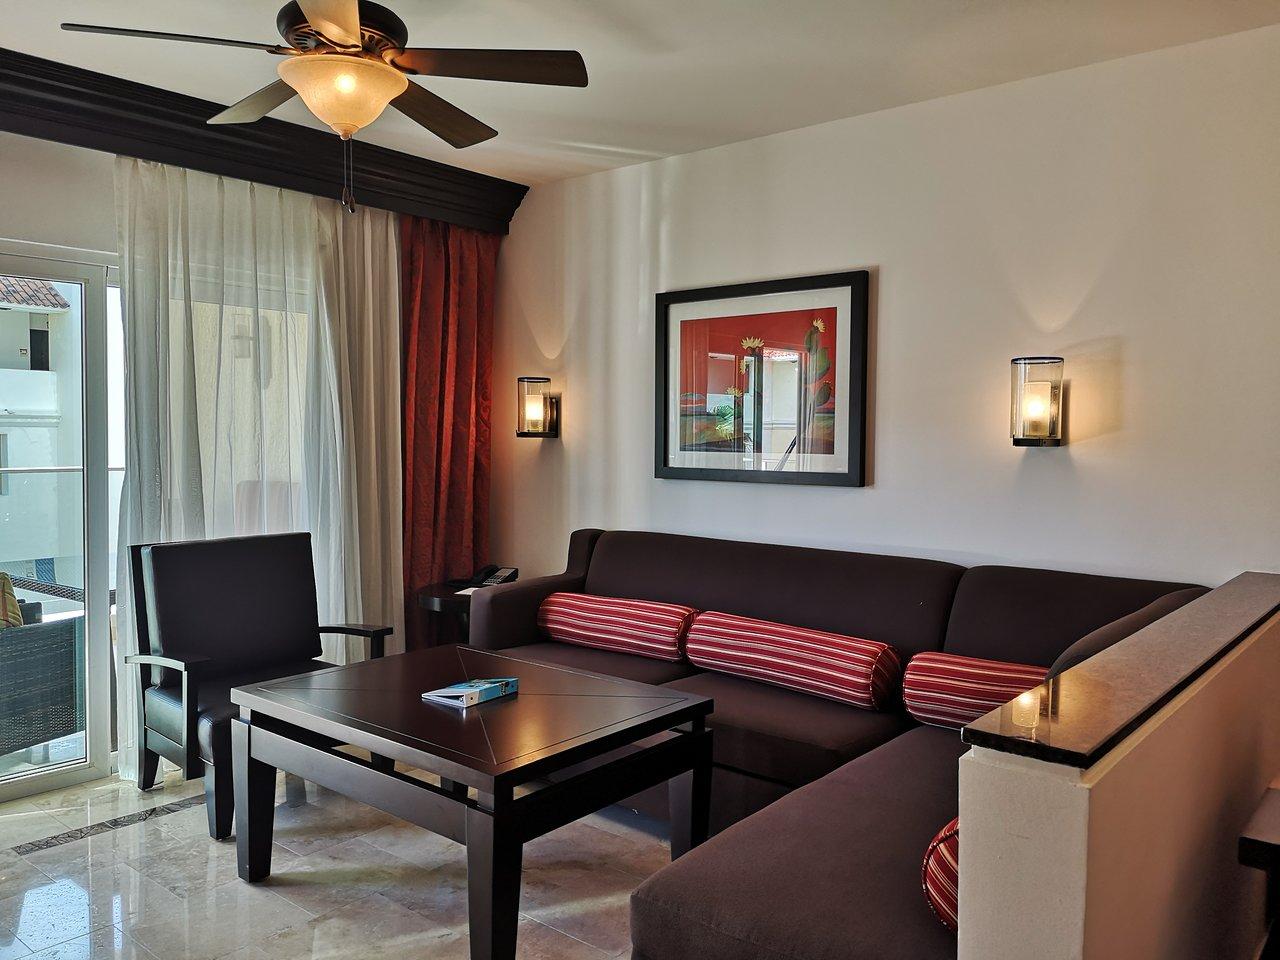 Welk_Resorts_Cabo_San_Lucas_Sirena_del_Mar_Living_Area_b4f01d8f21.jpg